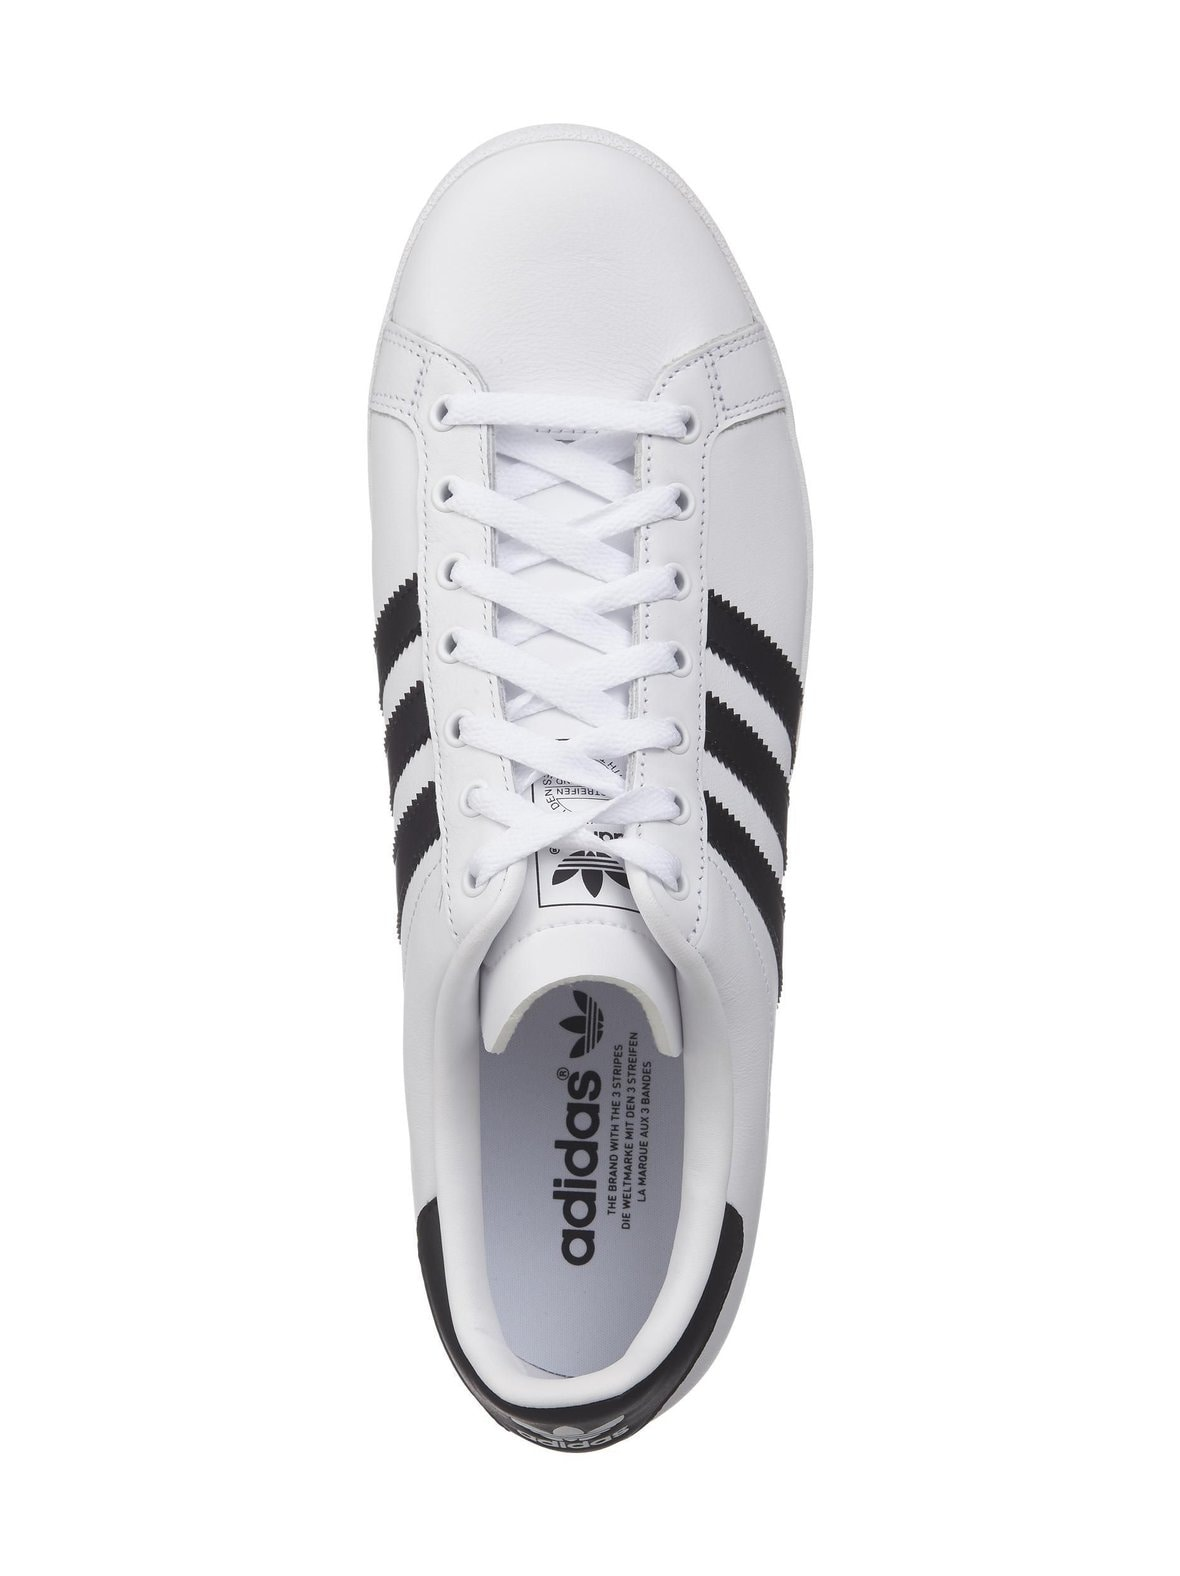 online store e13f1 3ffb5 Coast Star -nahkatennarit. Coast Star -nahkatennarit. 123. adidas Originals